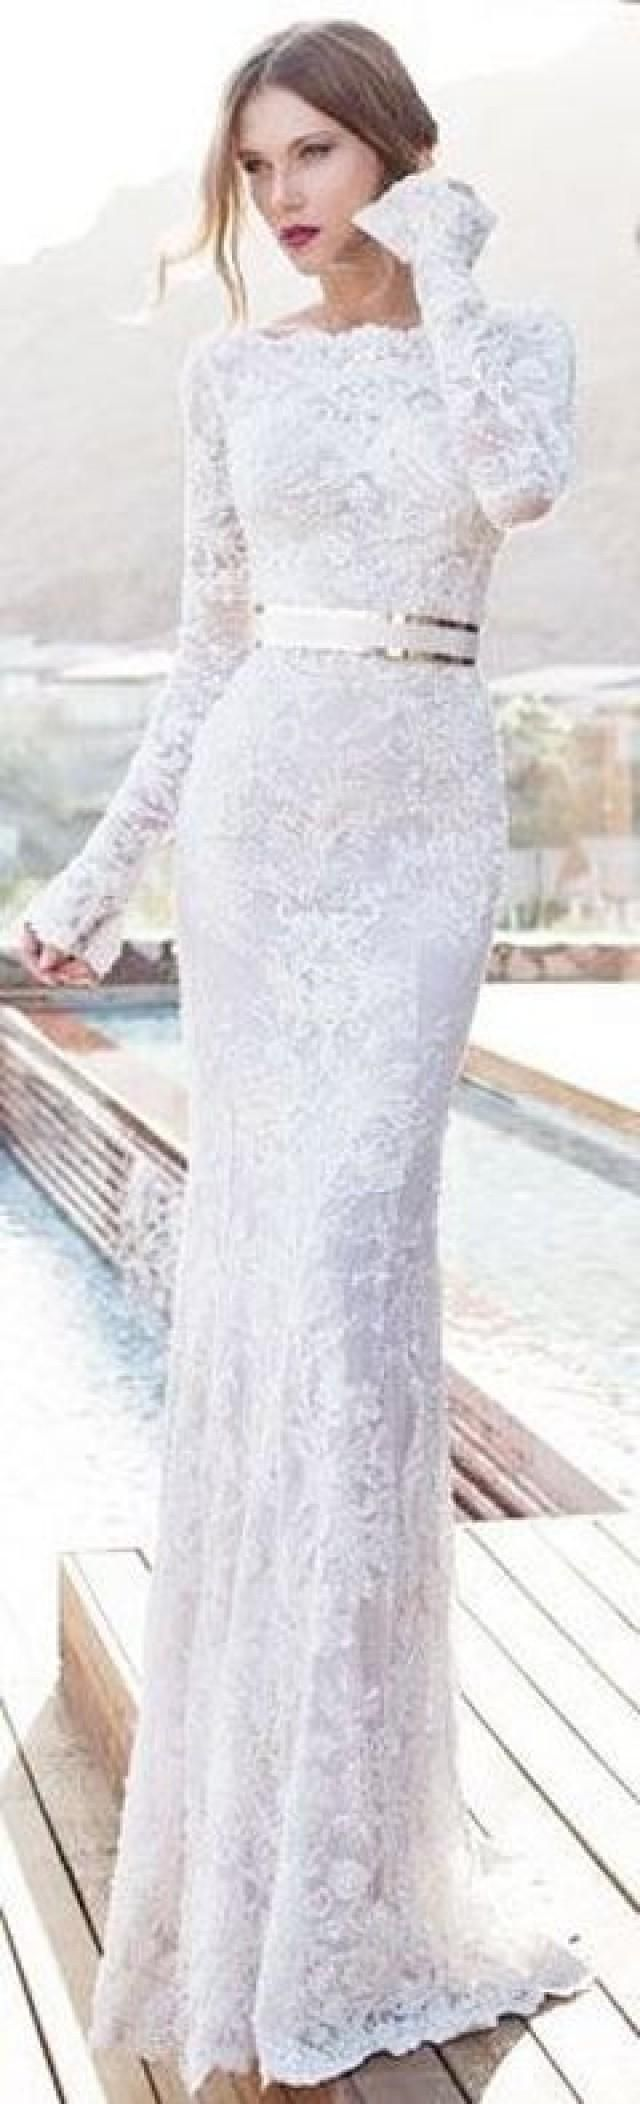 Wedding dresses from dresses pinterest wedding